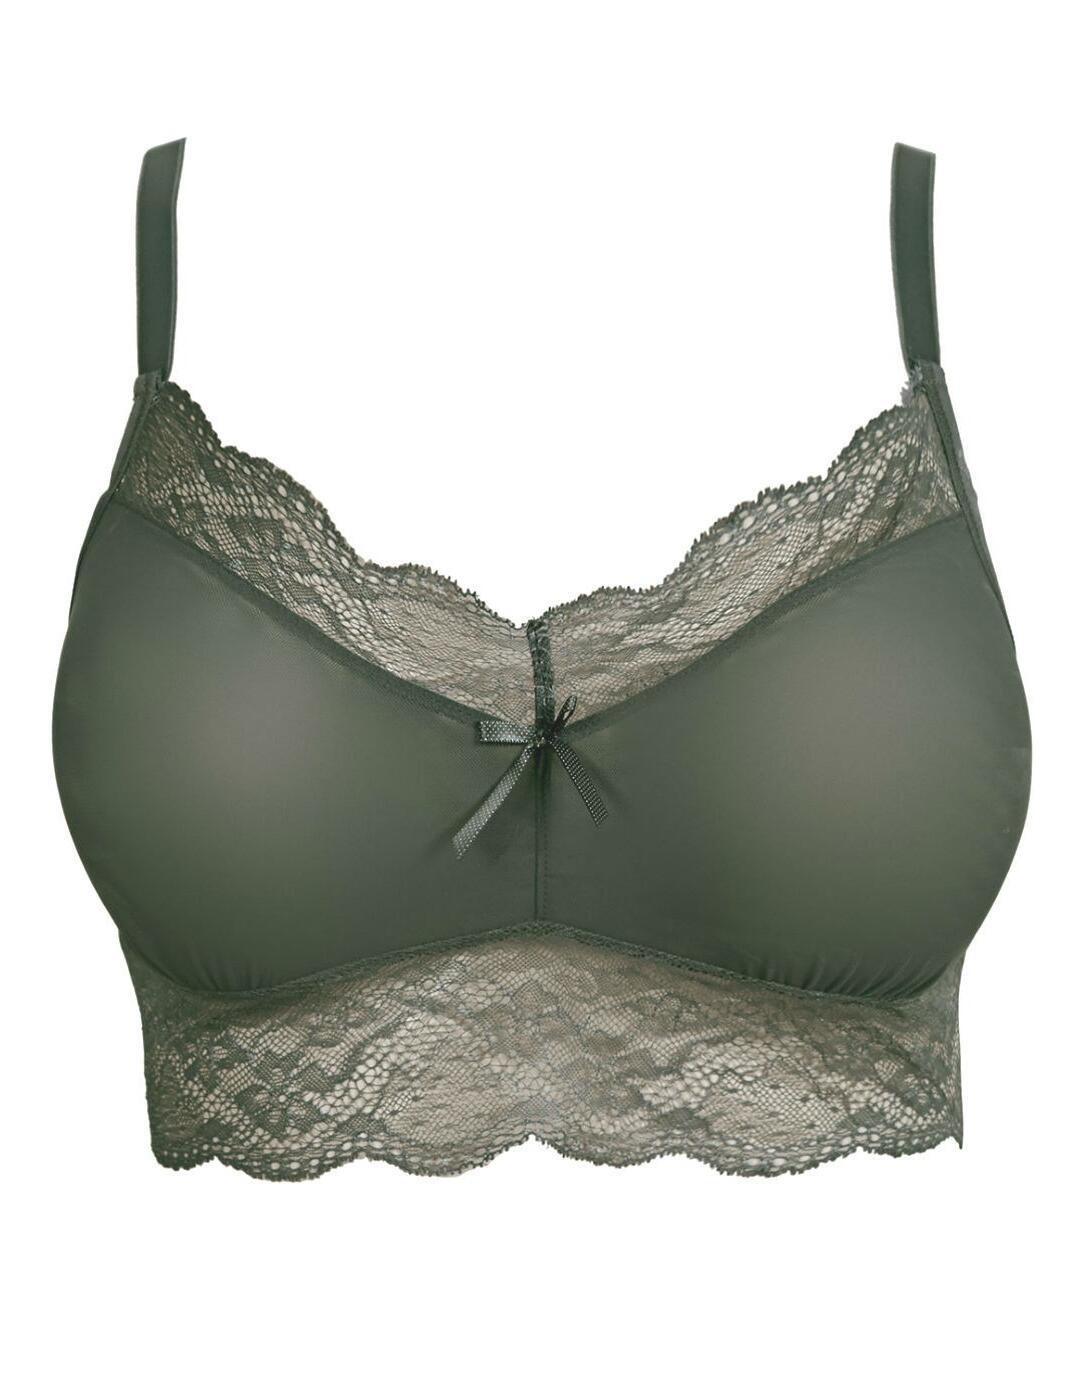 1010 Freya Fancies Bralette Bra Top - 1010 Olive